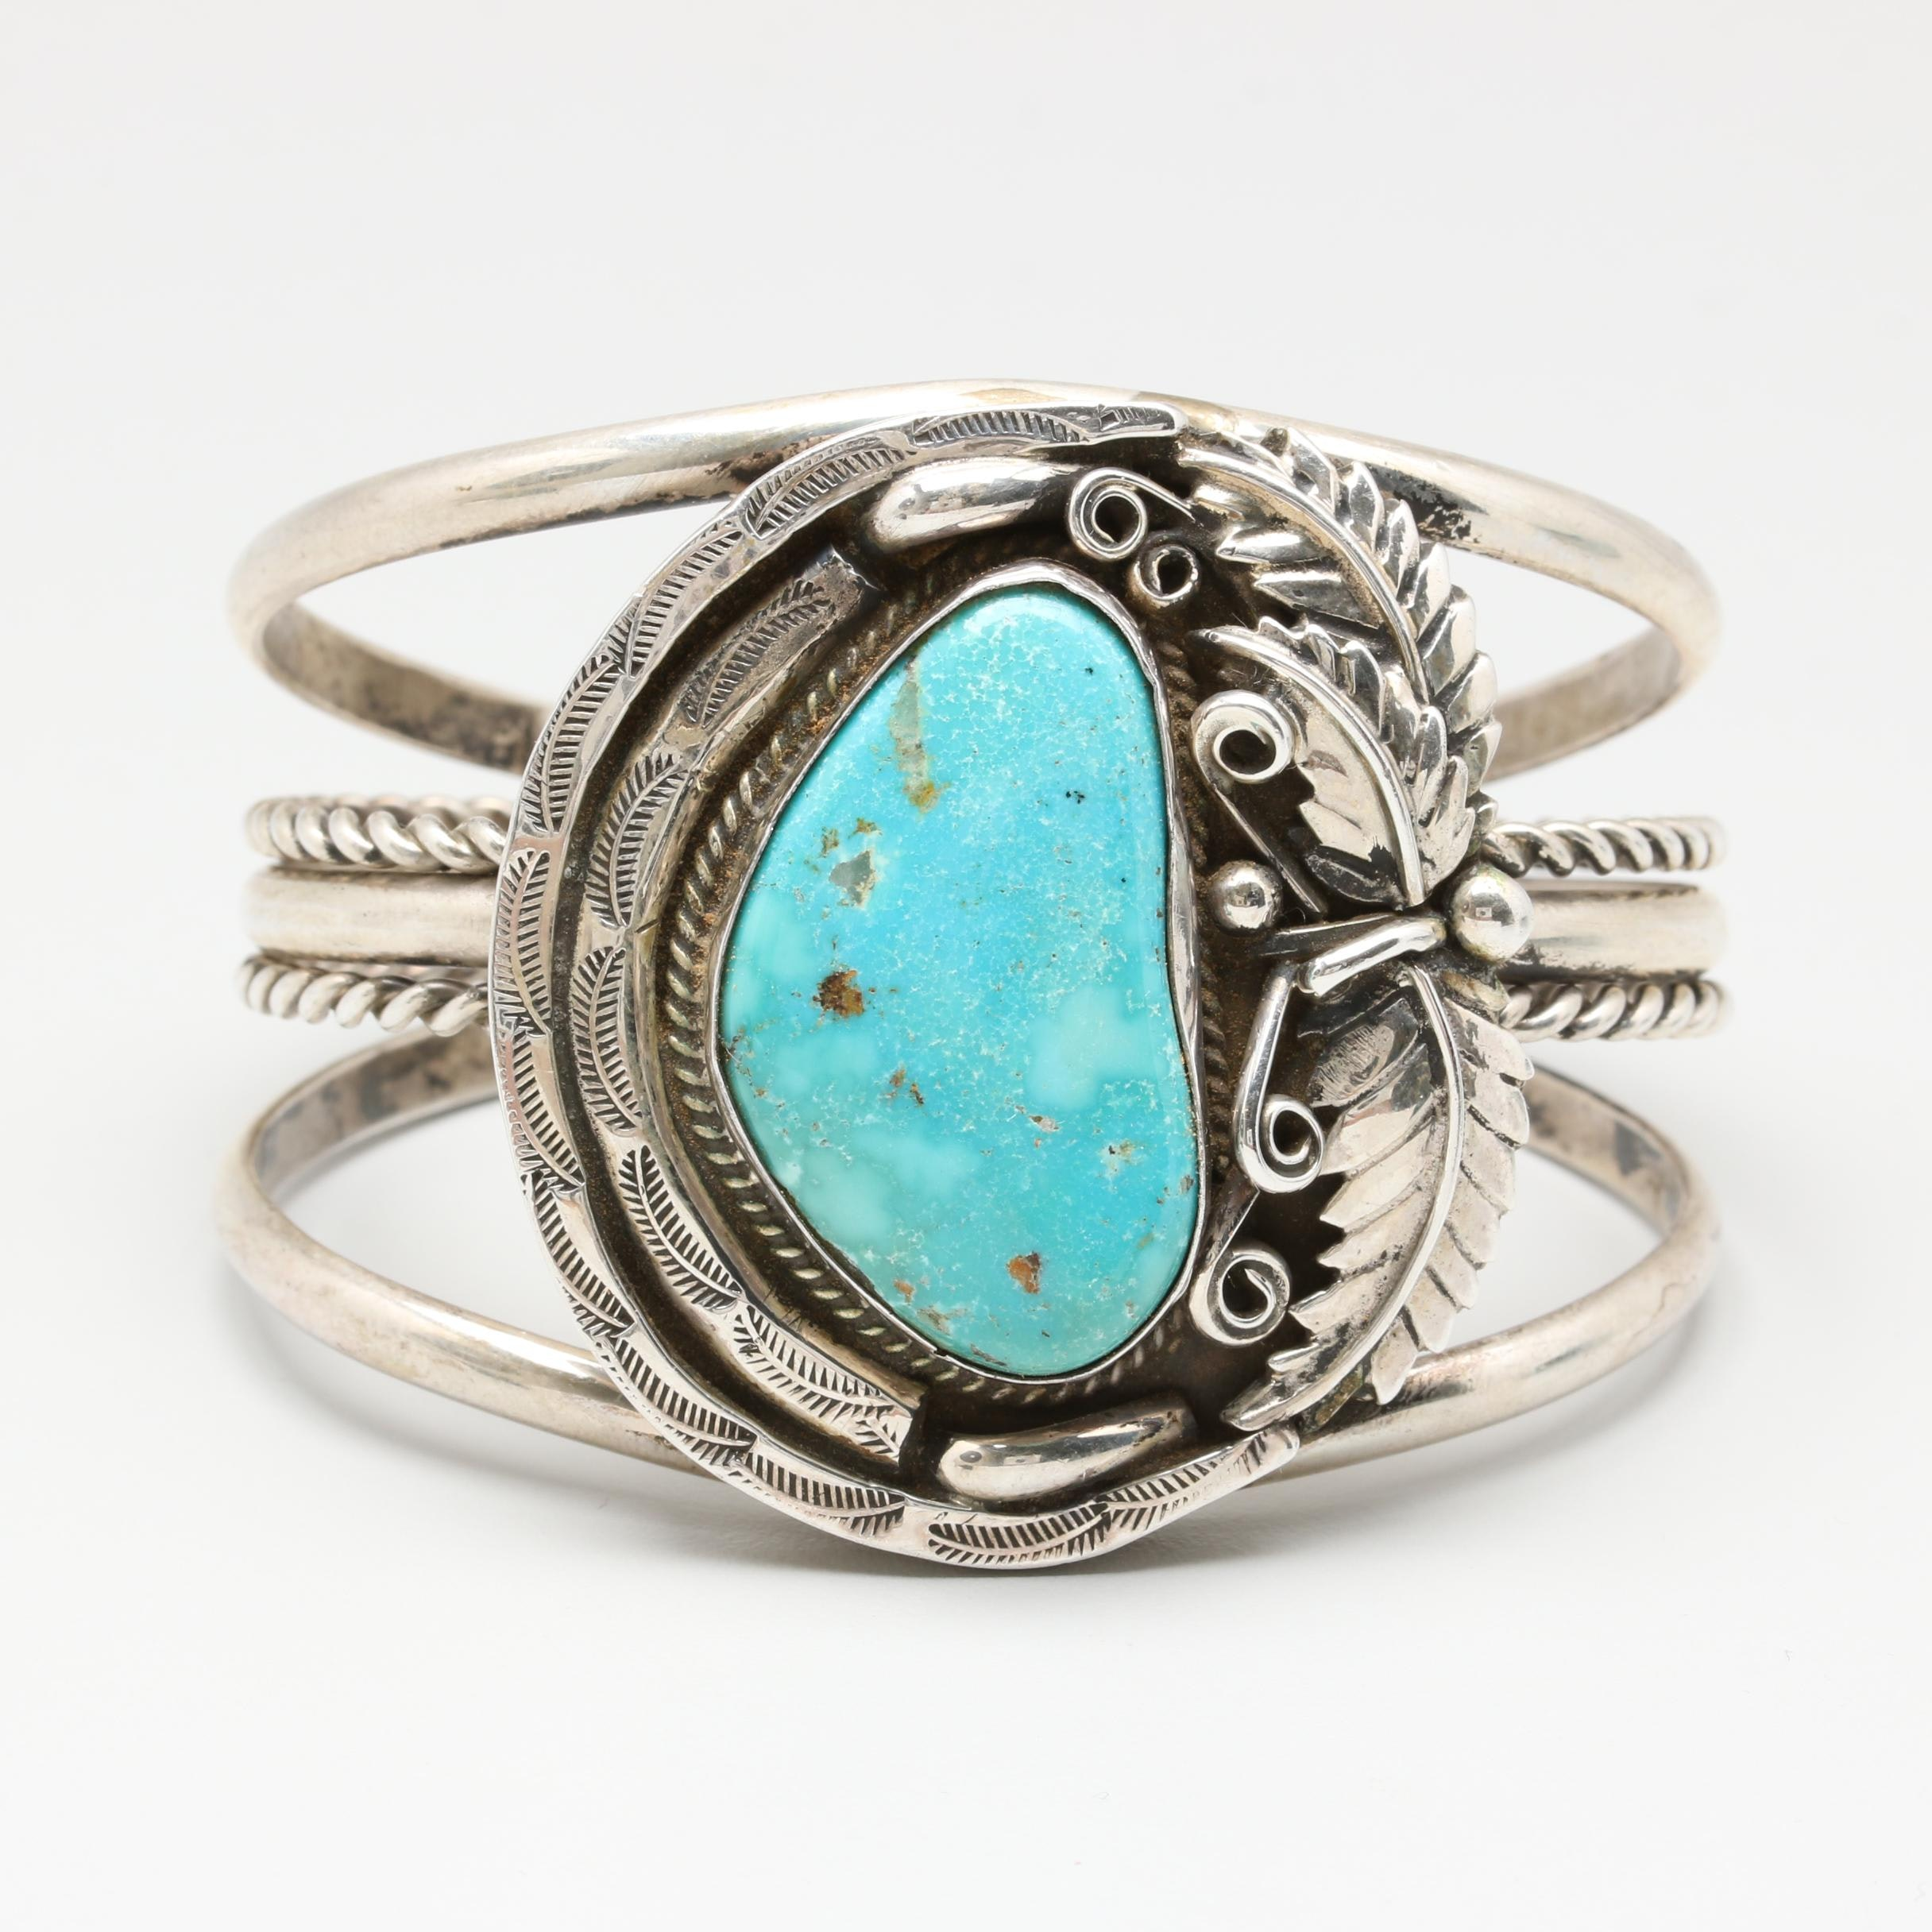 Freda Hansen Navajo Diné Stabilized Turquoise Cuff Bracelet